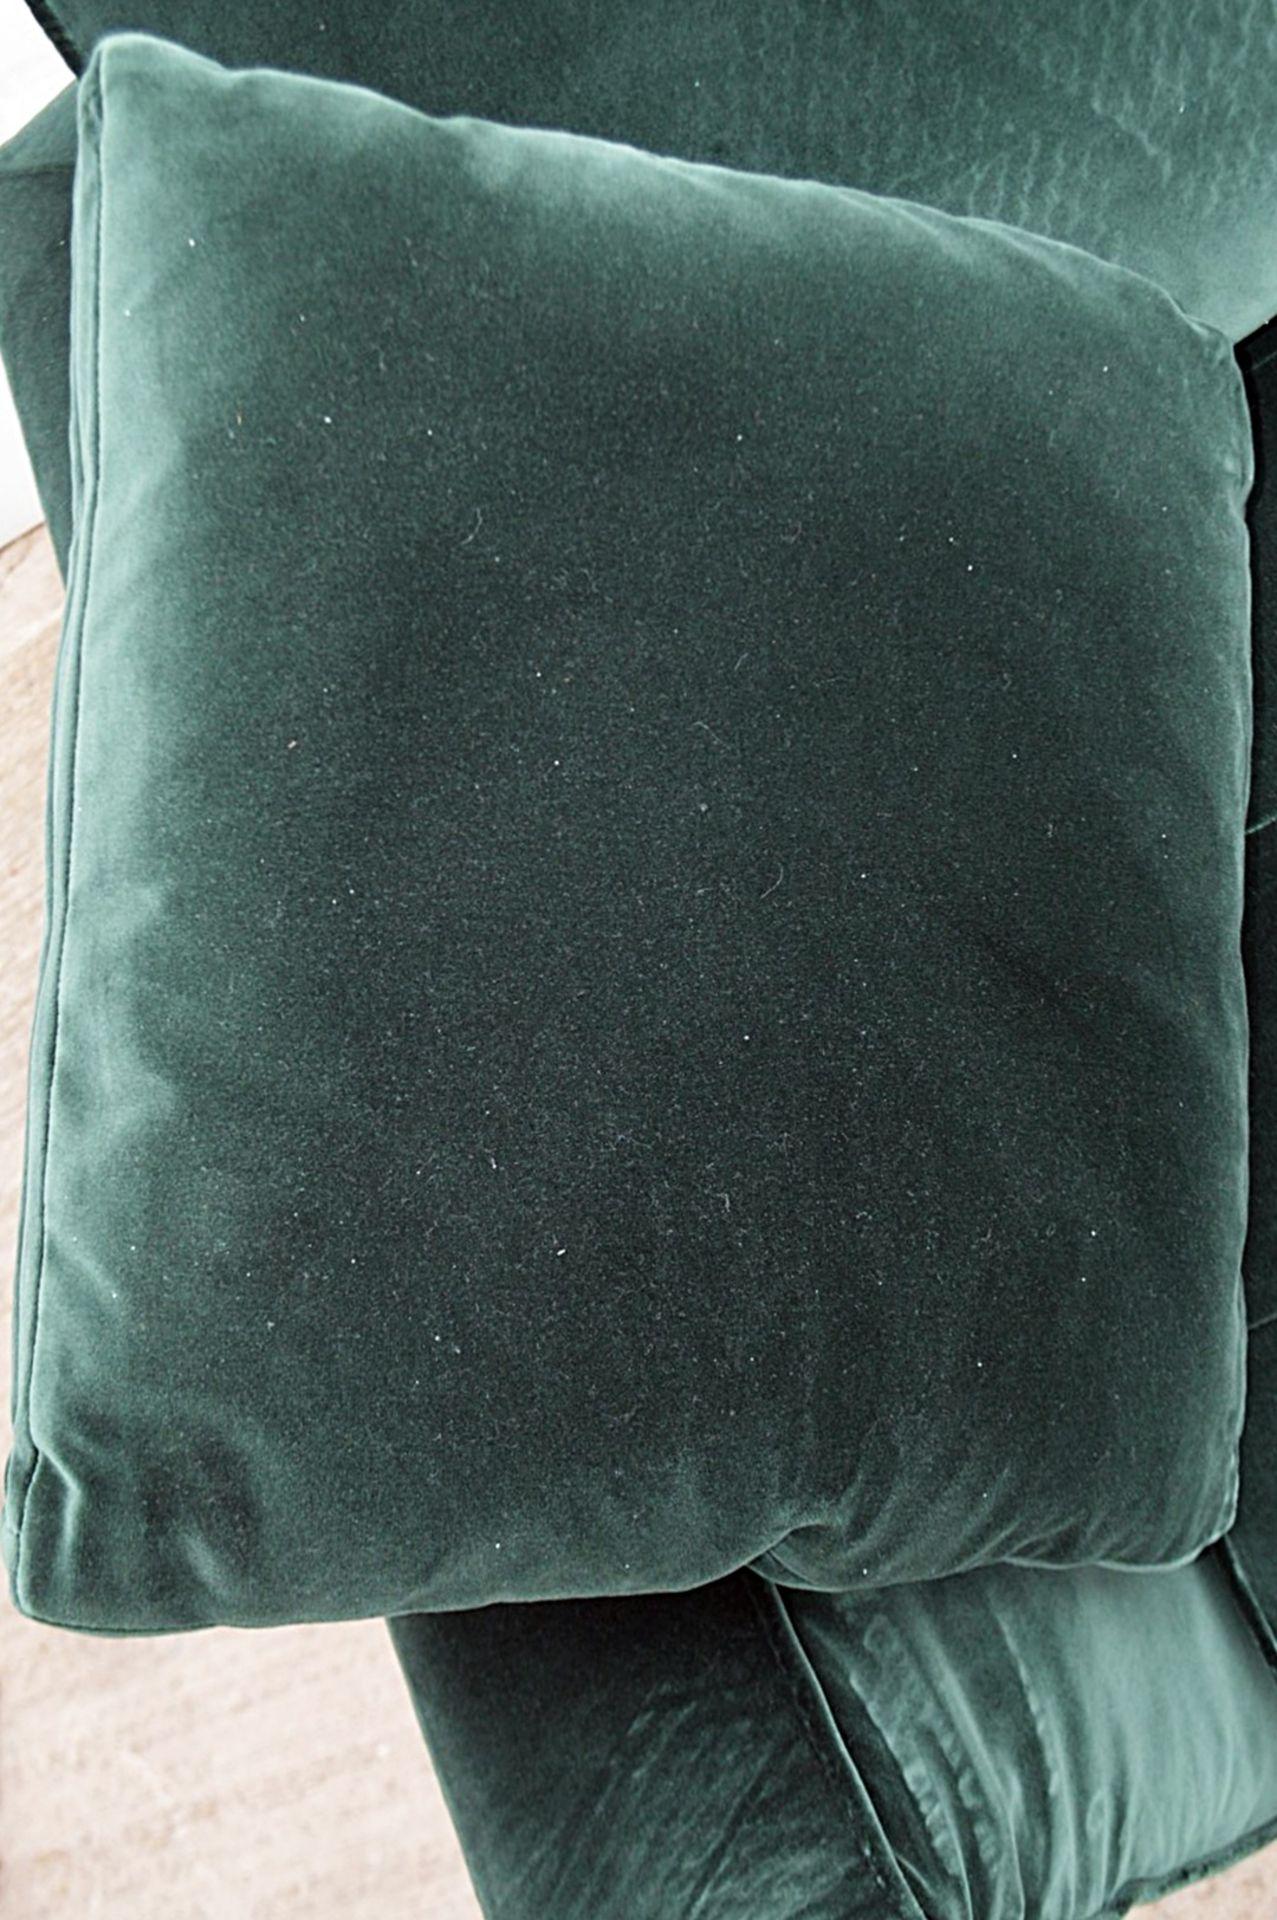 2 x B&B Italia MAXALTO Luxury Sofa Sections Both Upholstered In Rich Dark Green Velvet - RRP £7,248 - Image 13 of 13